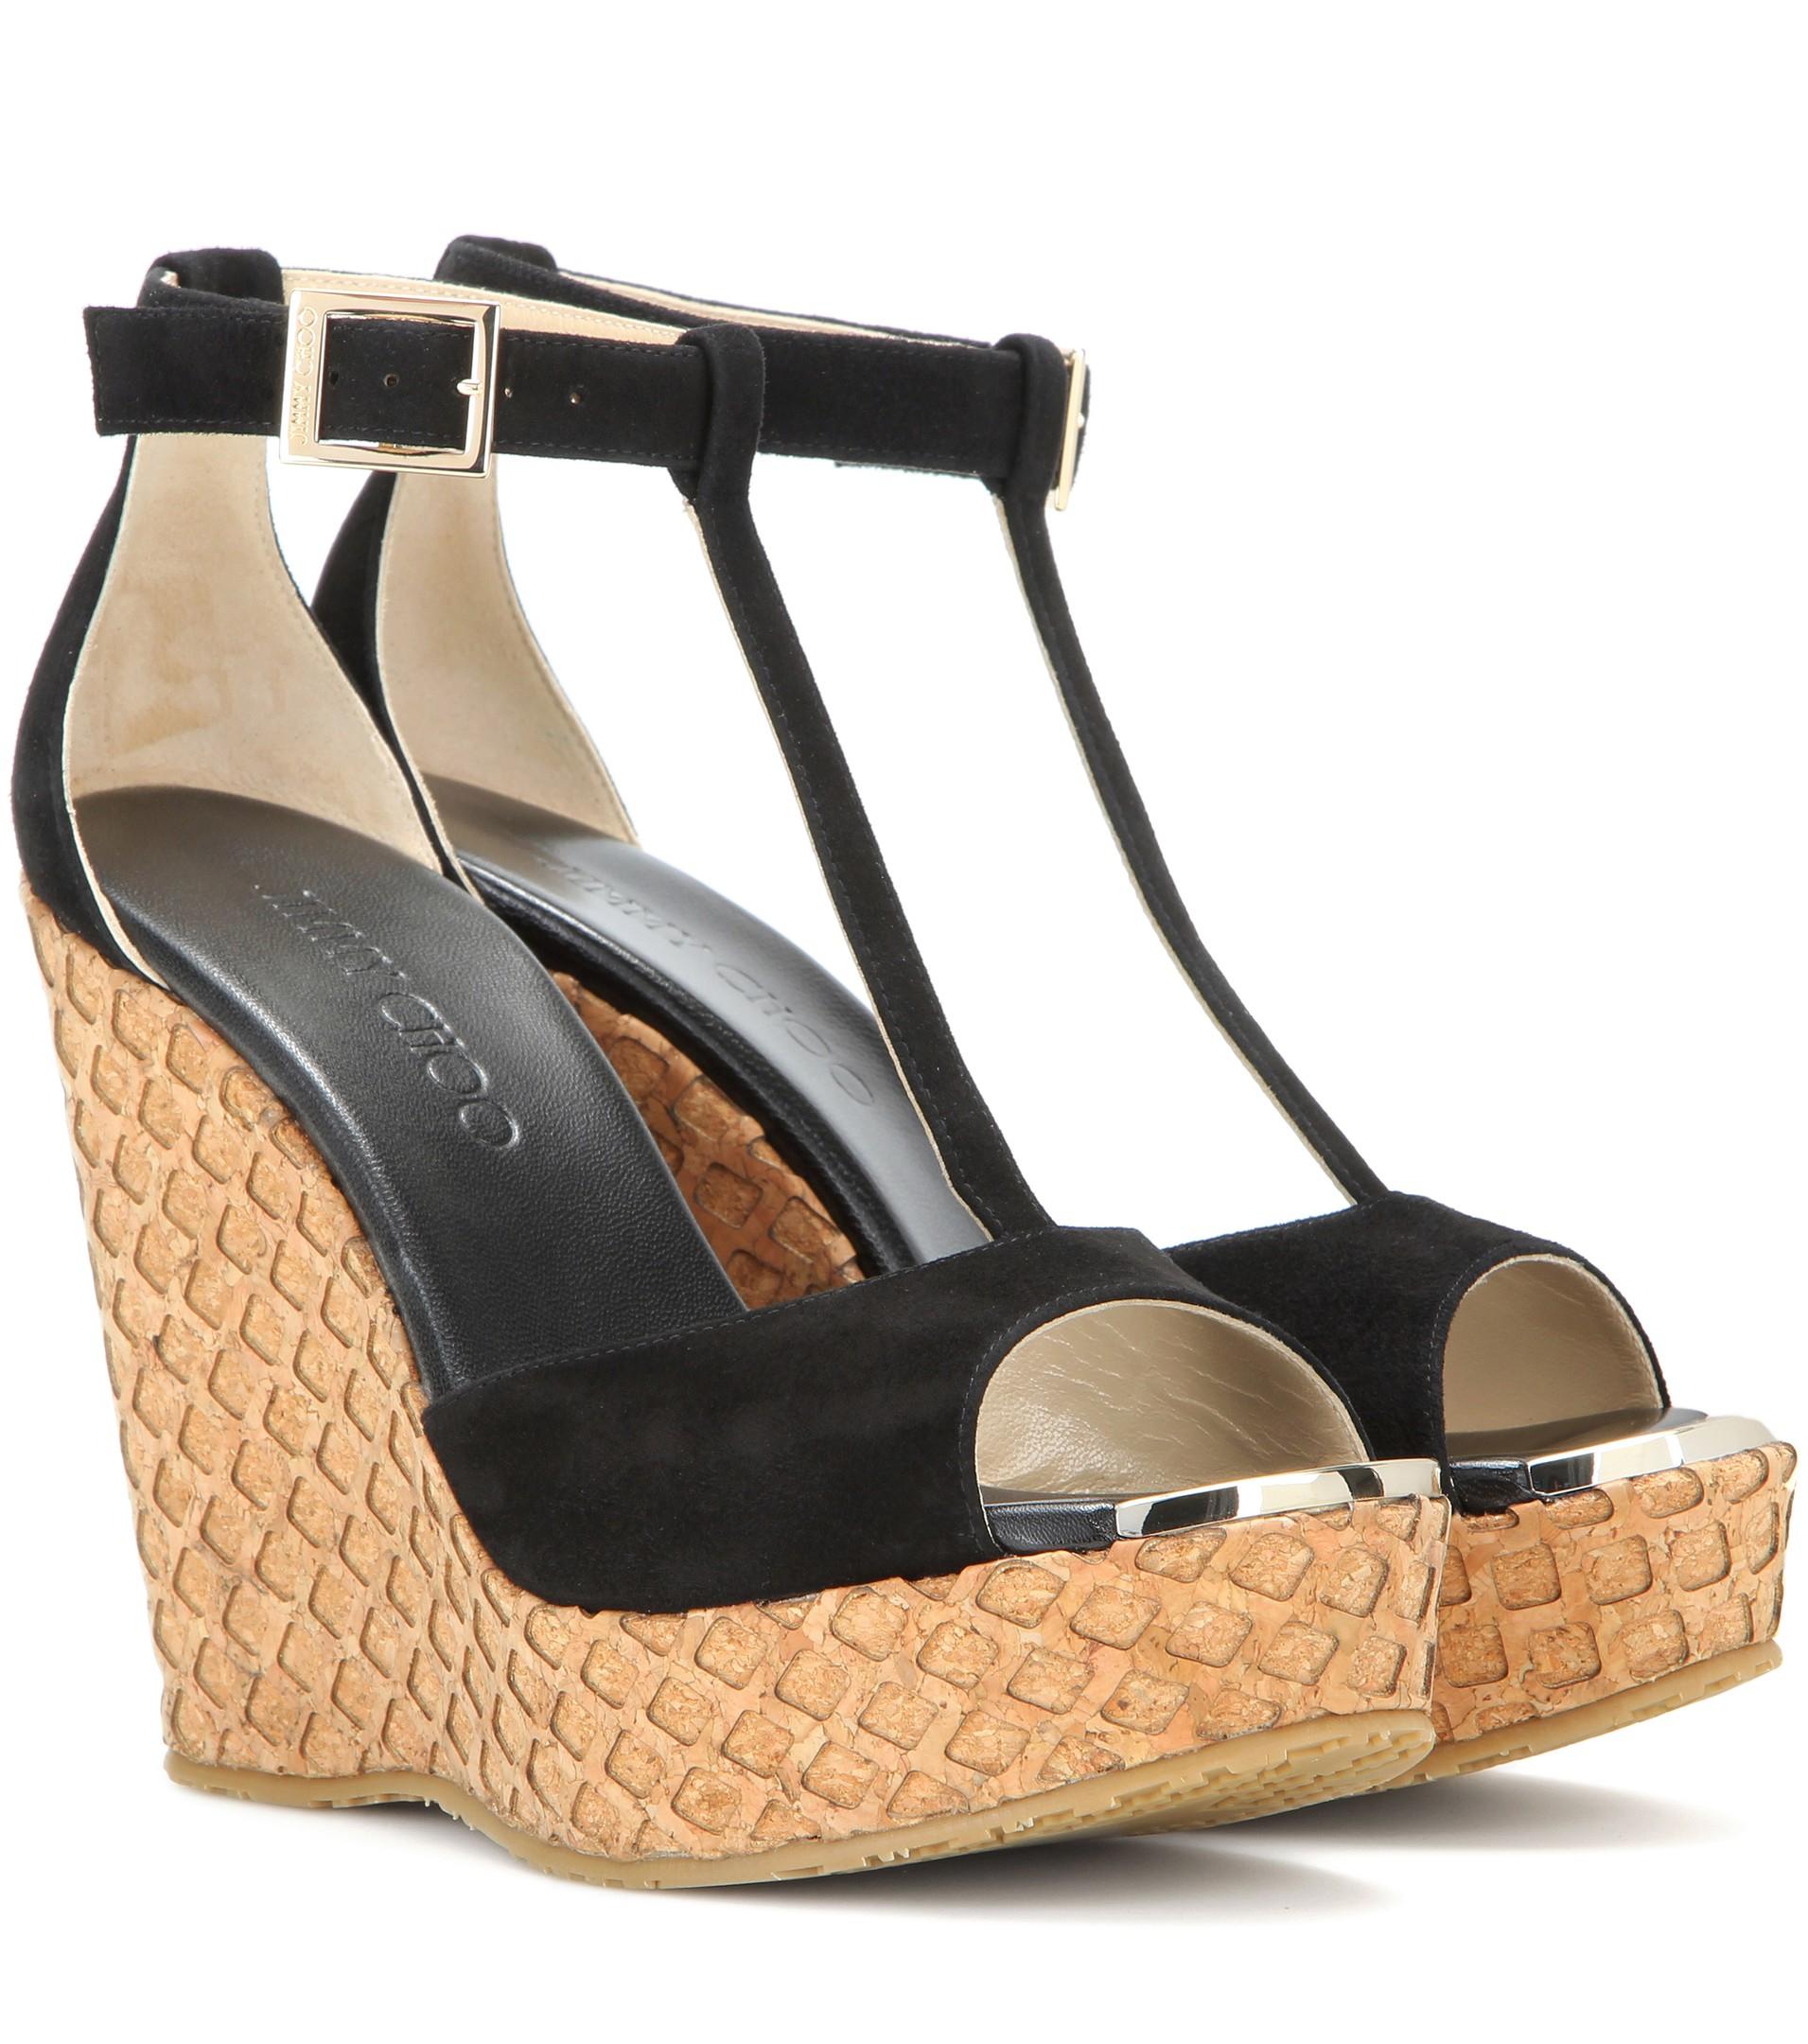 Jimmy Choo Portia Suede Wedge Sandals In Black